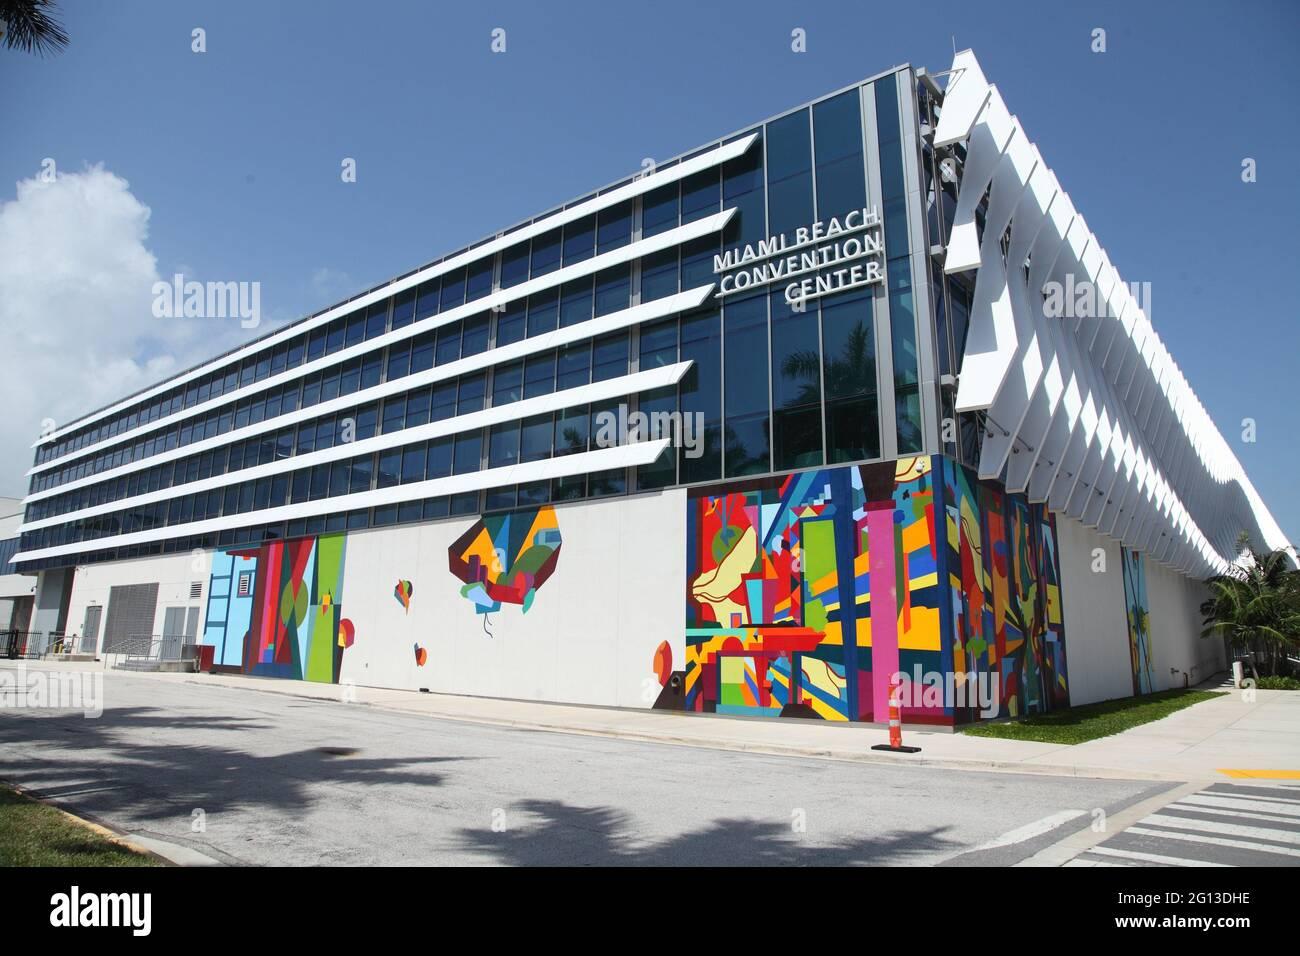 Miami Beach Convention Center in Miami beach, Florida, USA Stock Photo